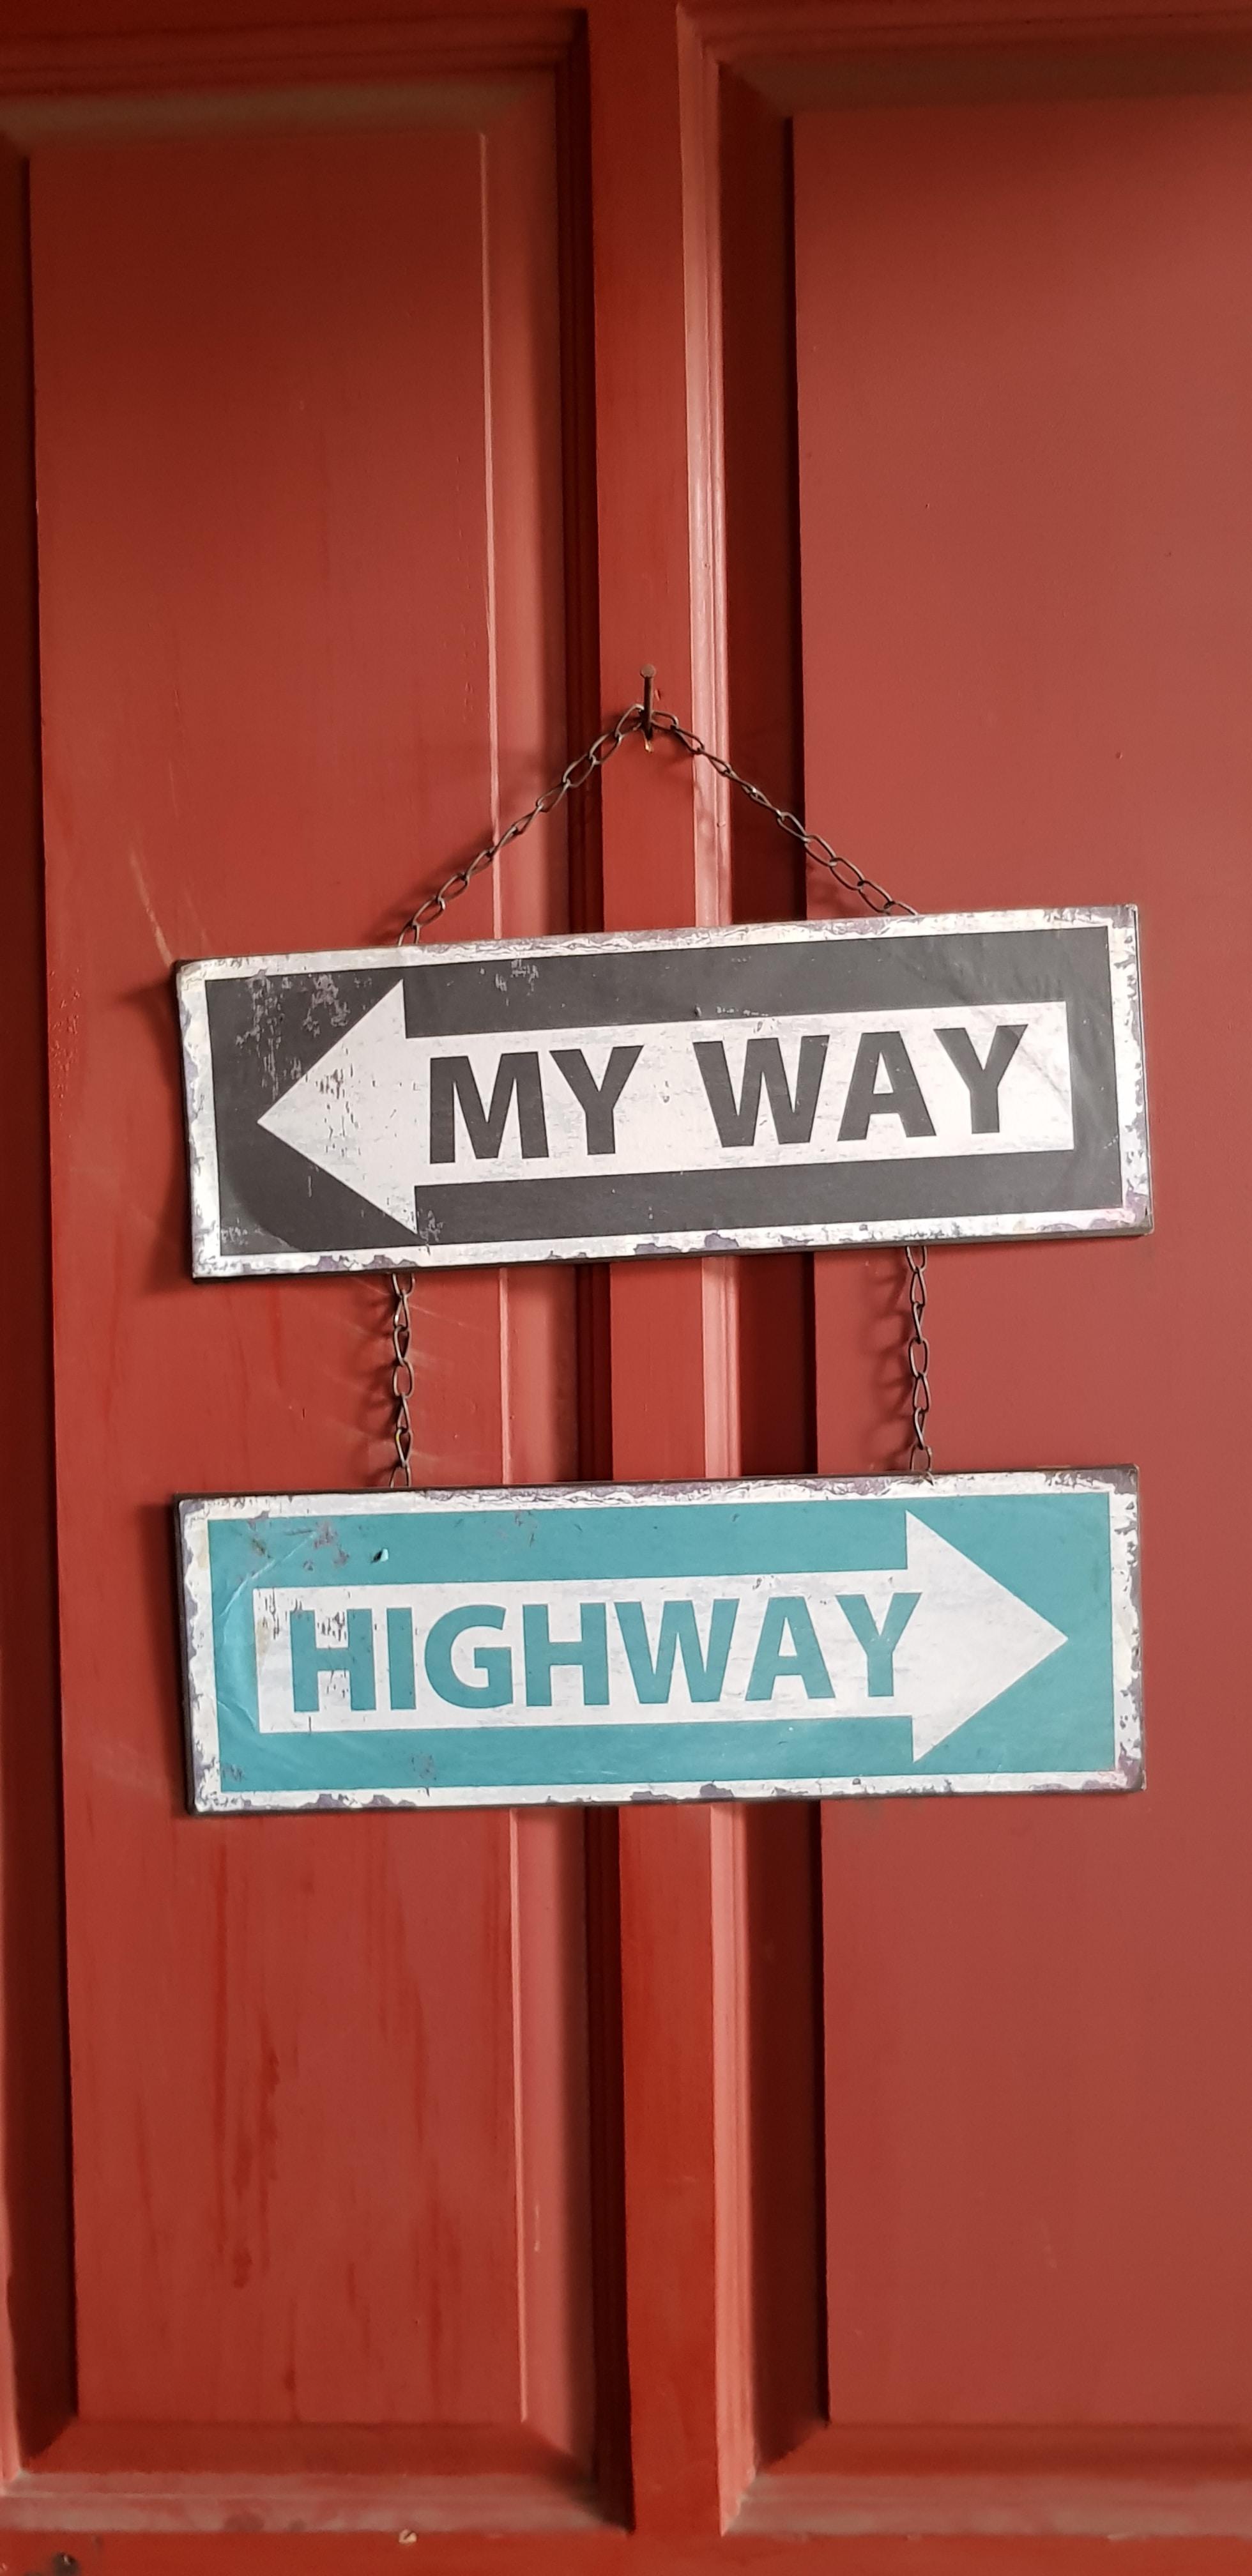 My Way signage